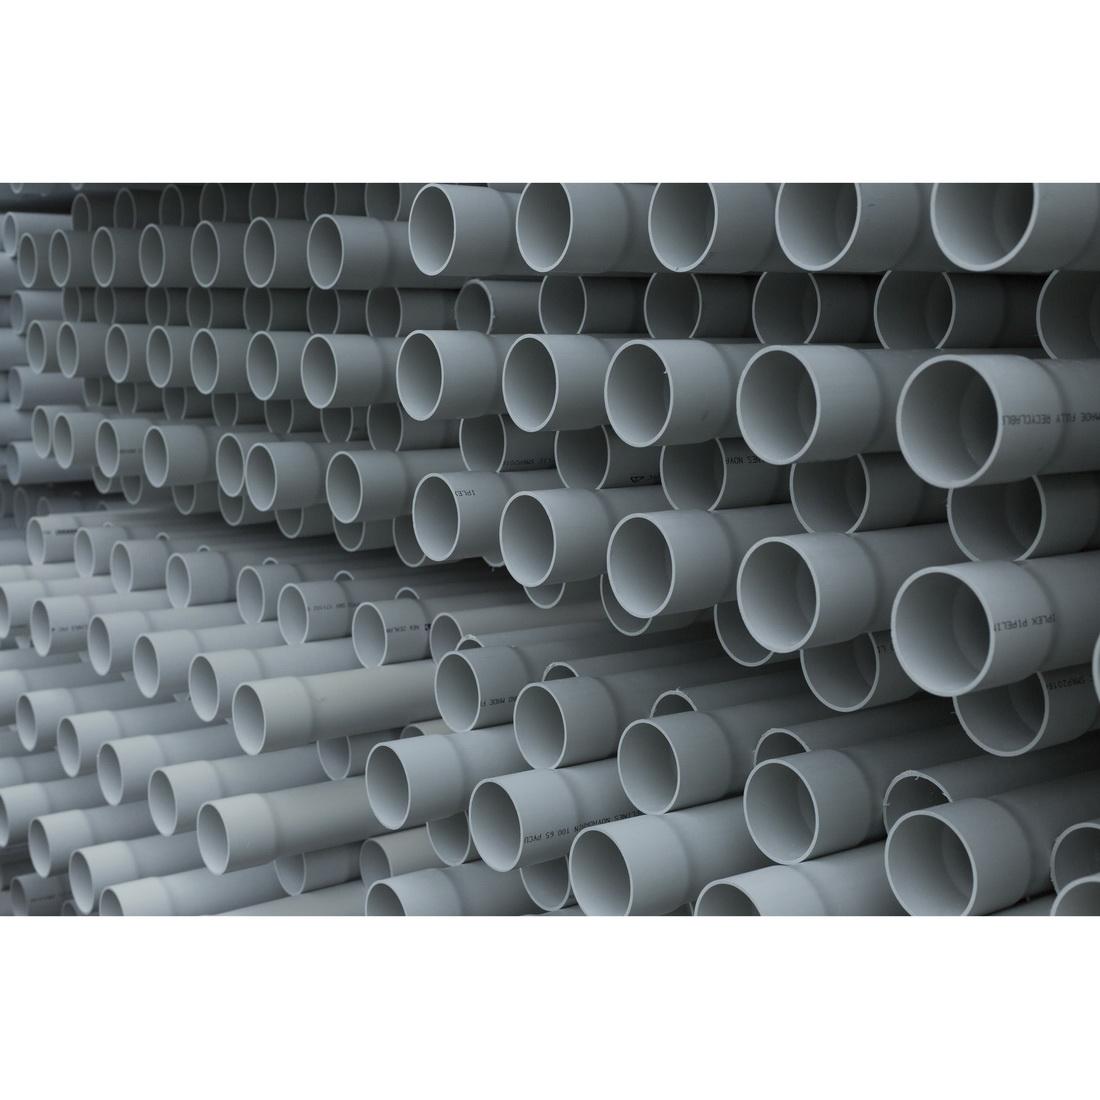 Novadrain PVC-U Drain Water Vent Pipe 40mm x 6m Socketed One End